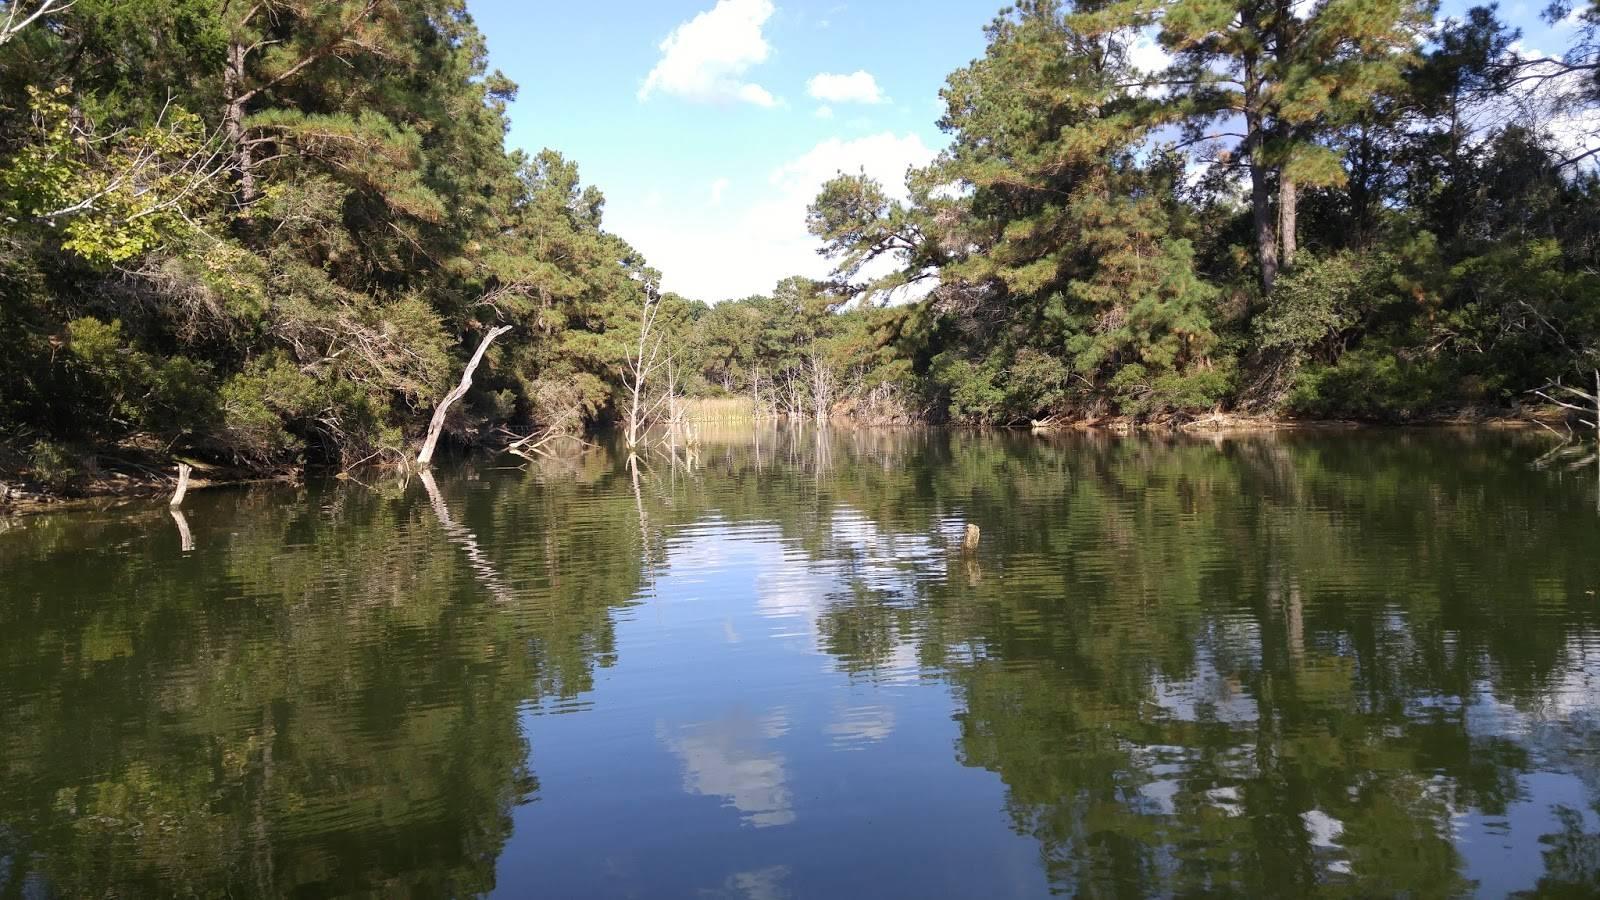 Lake Bastrop Texas kayak fishing on a beautiful day.